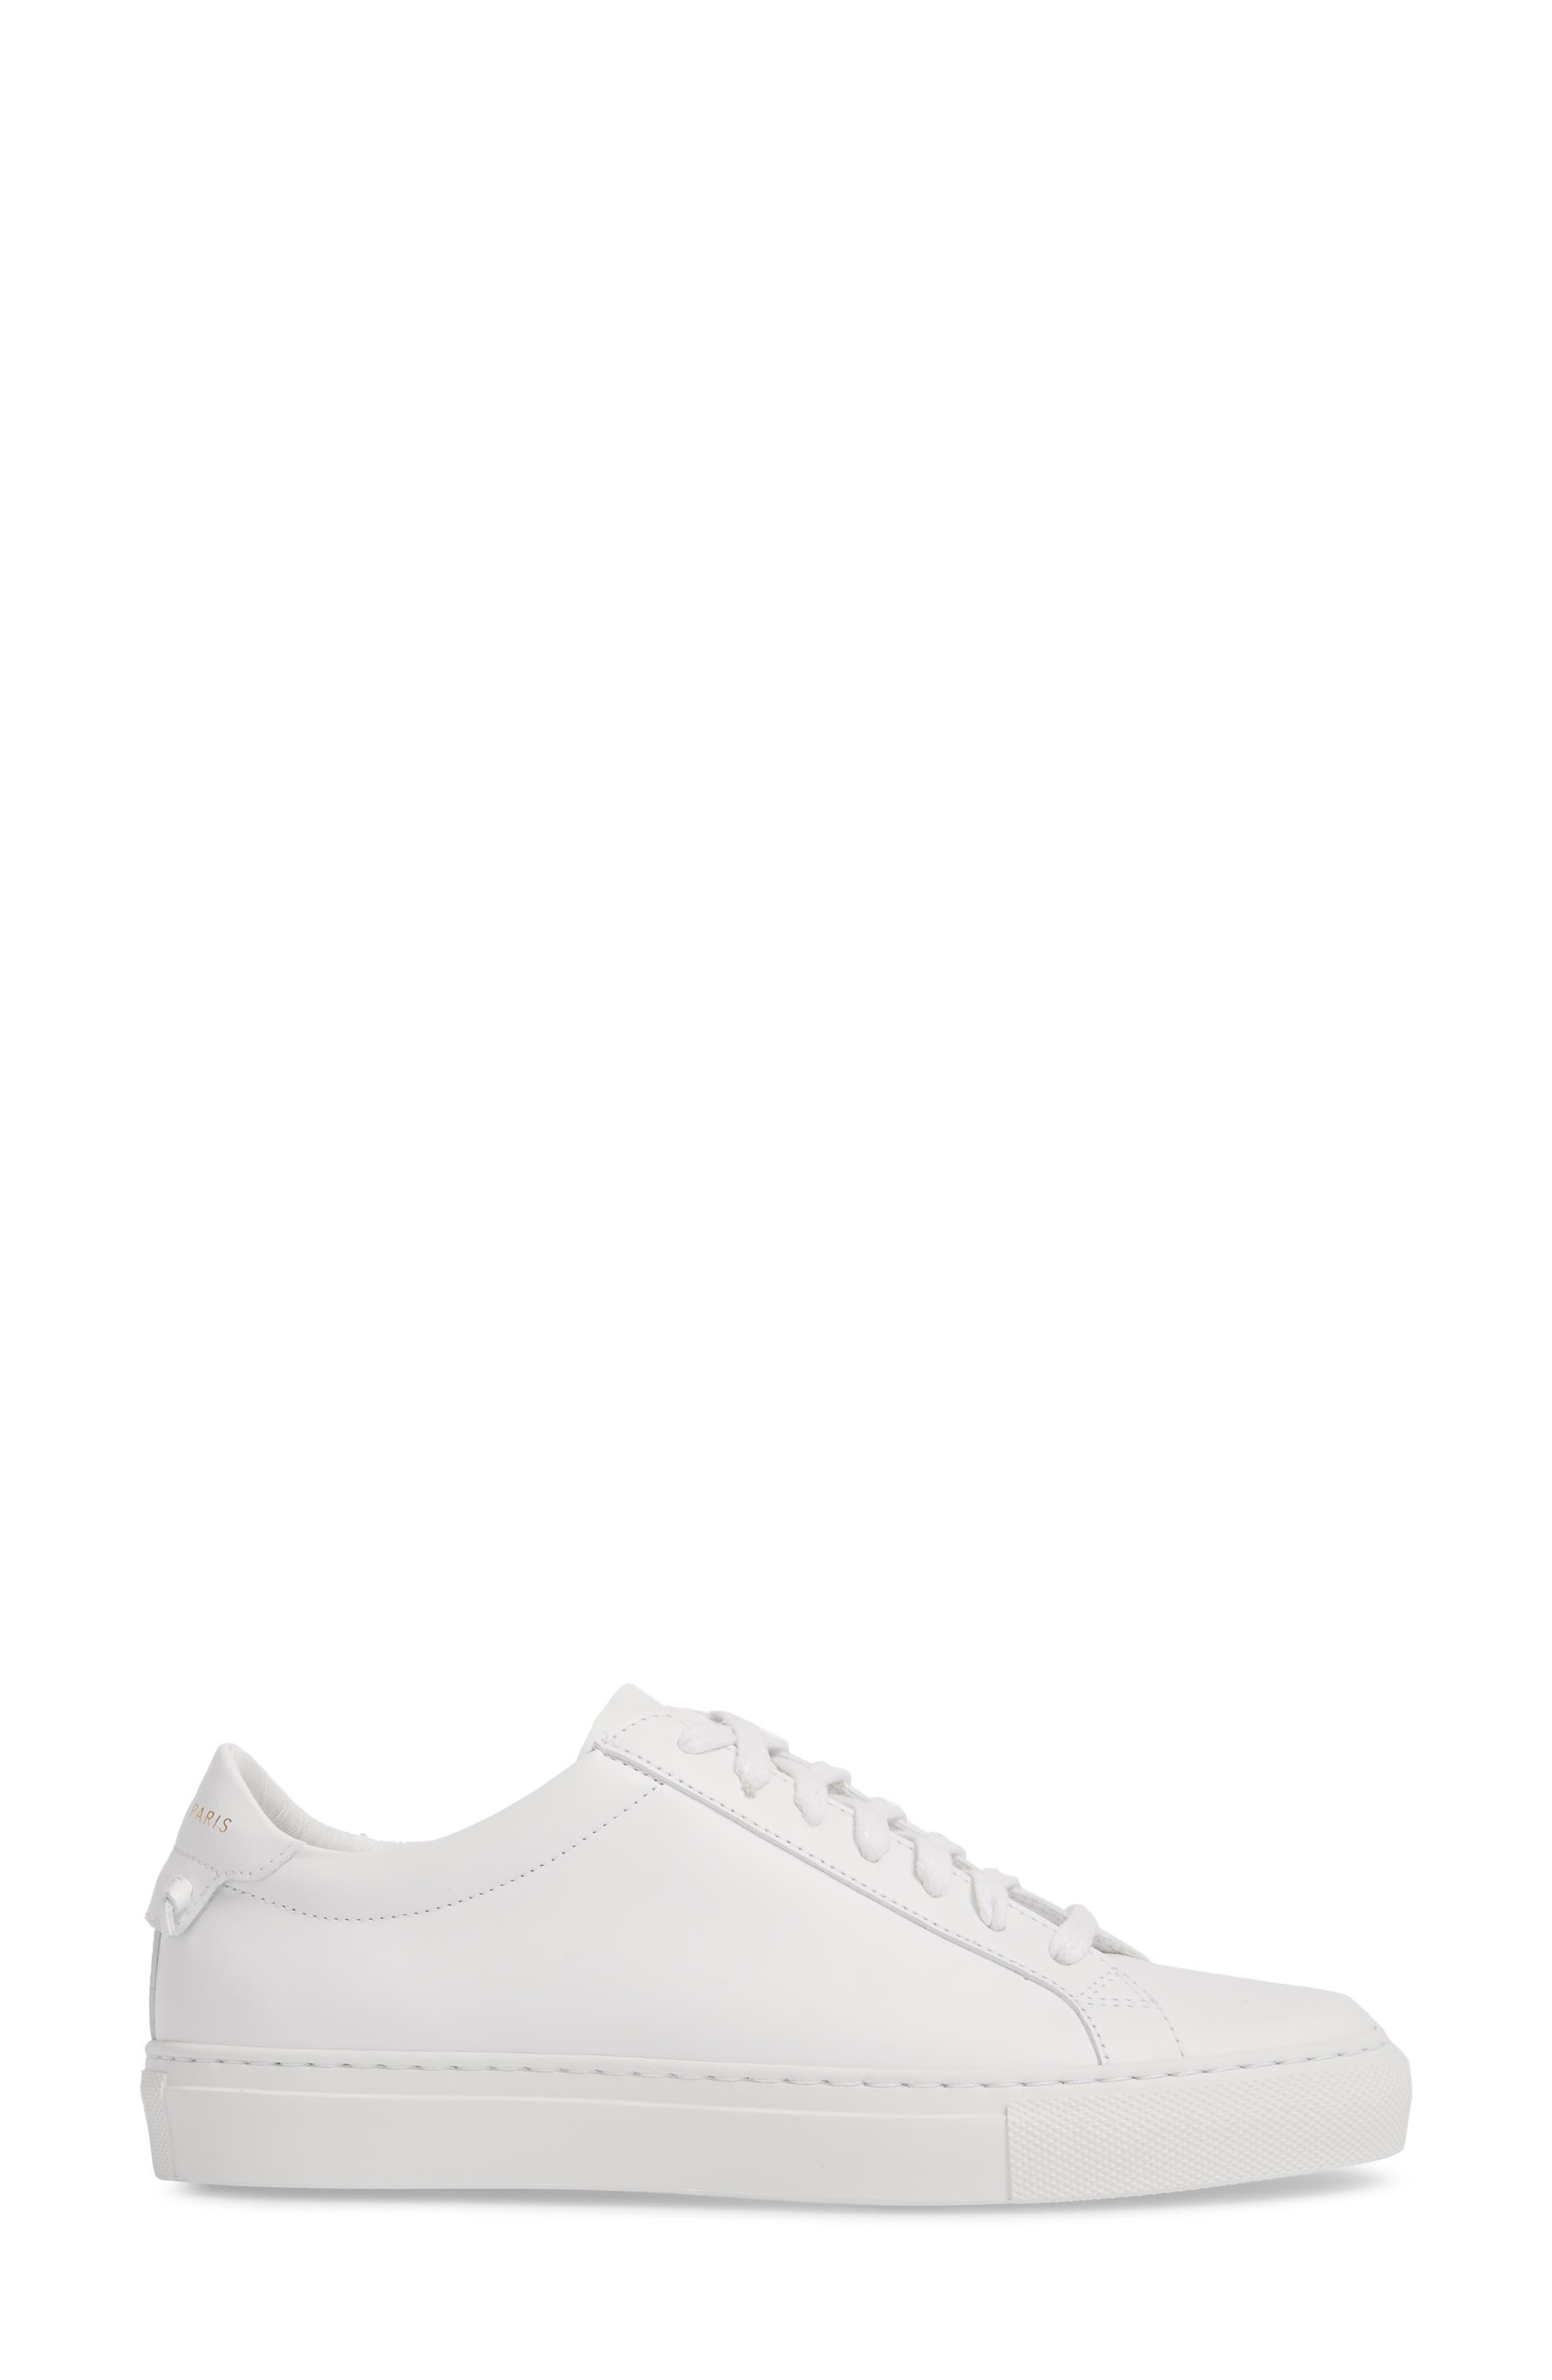 Low Top Sneaker,                             Alternate thumbnail 3, color,                             OPTIC WHITE